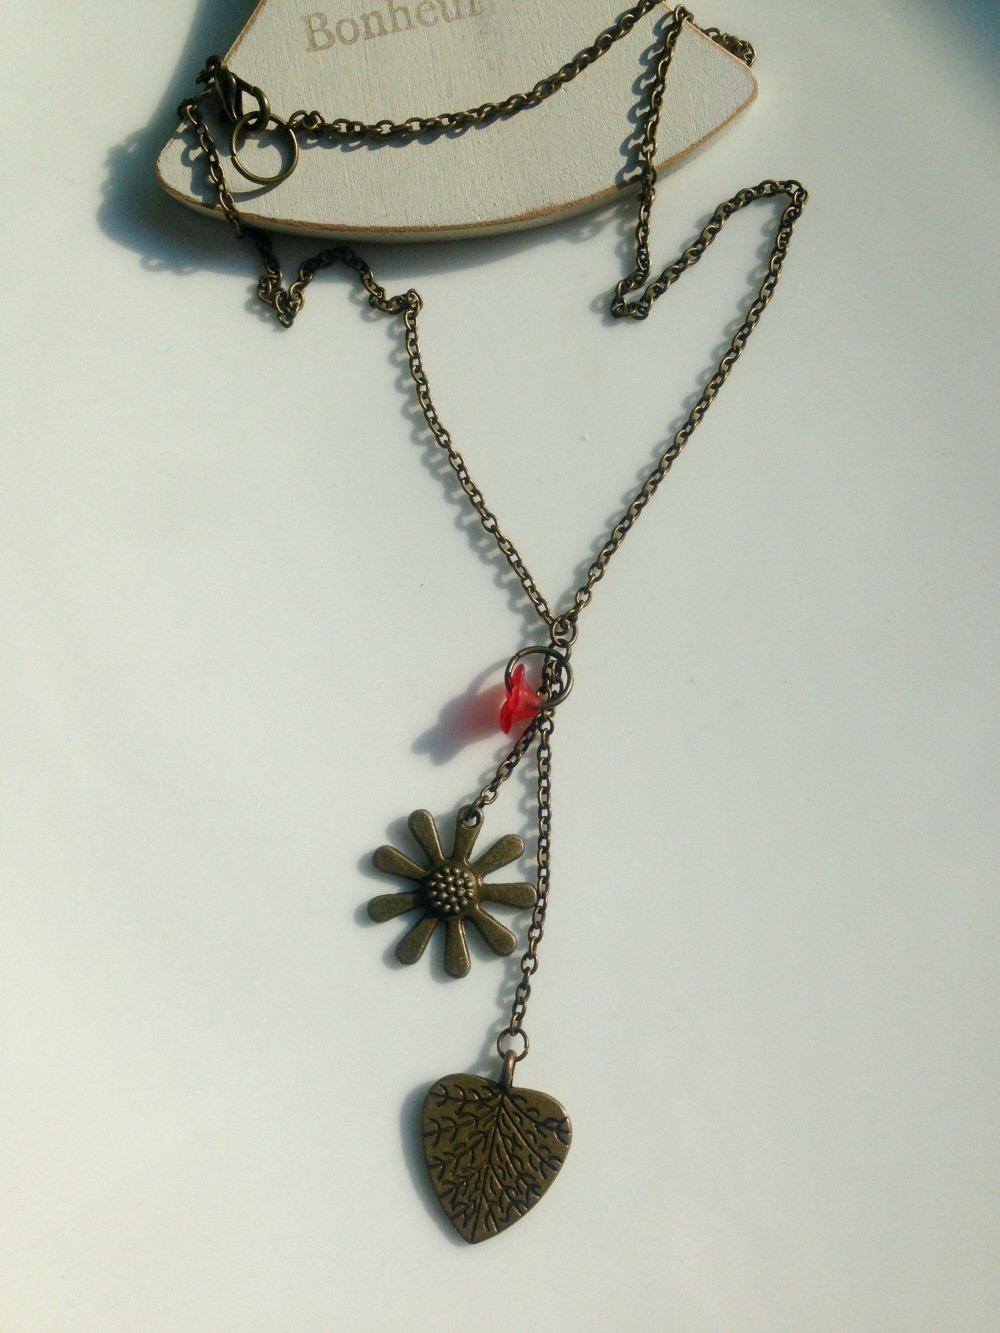 Collier chaîne bronze breloques et tulipe rouge